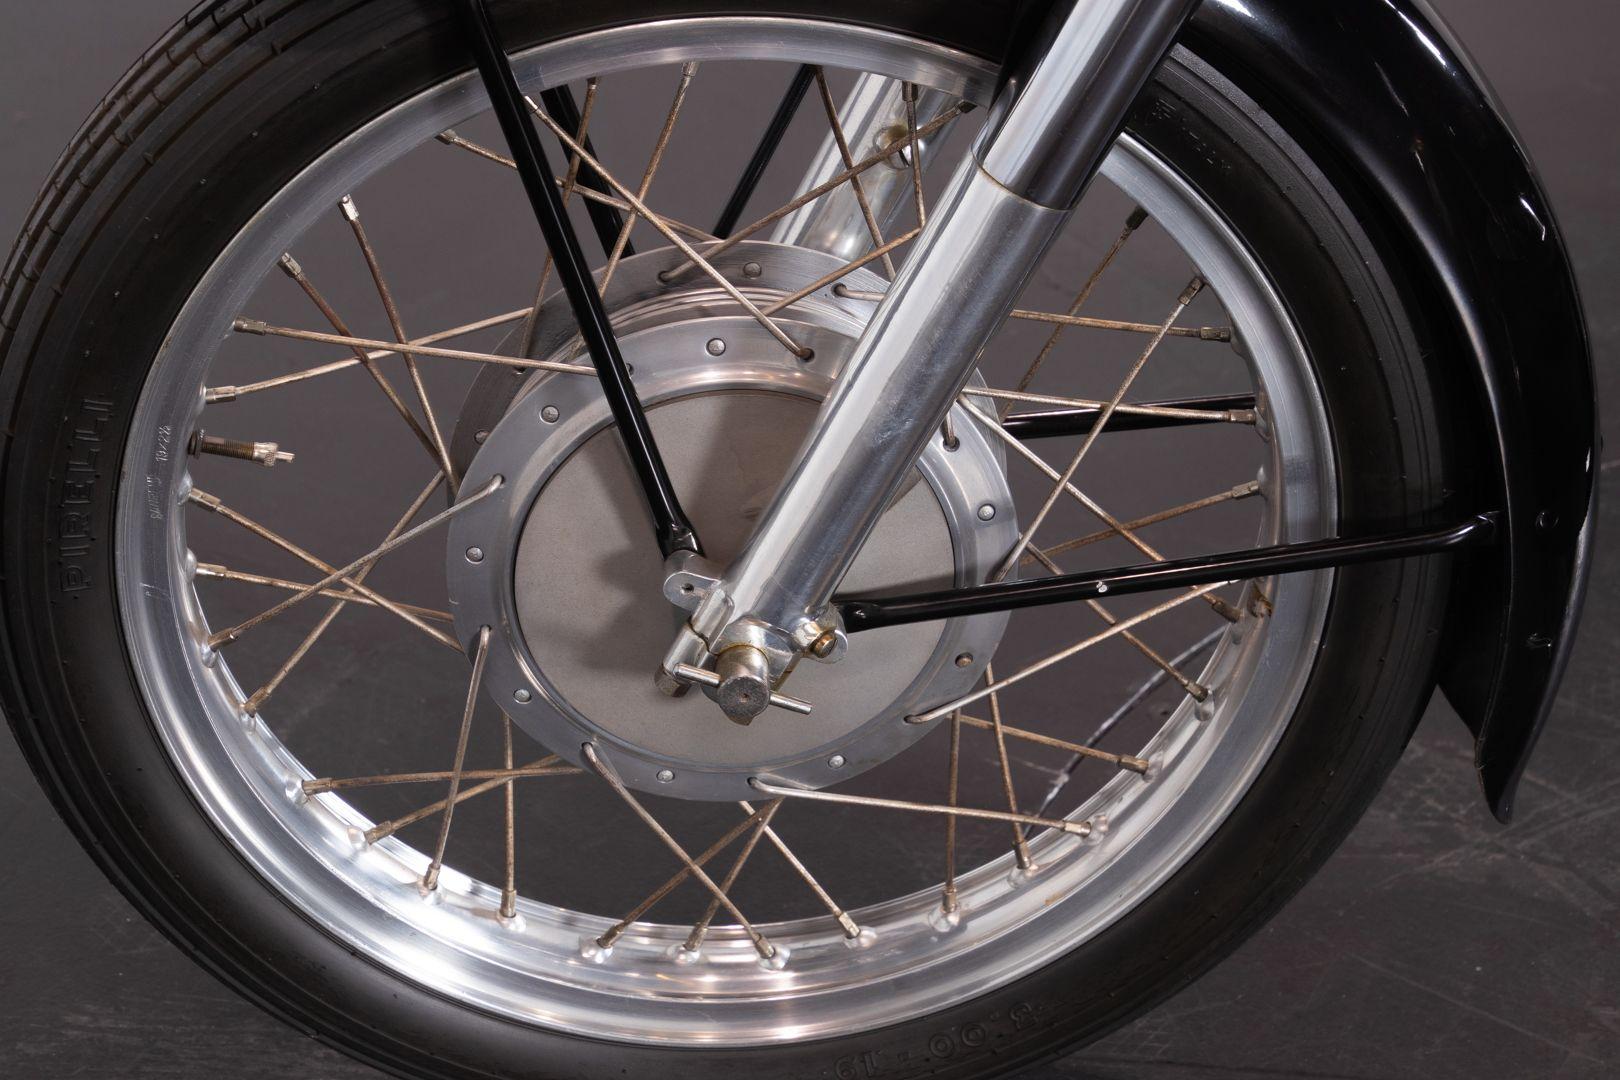 1955 Benelli 250 Leonessa 74313